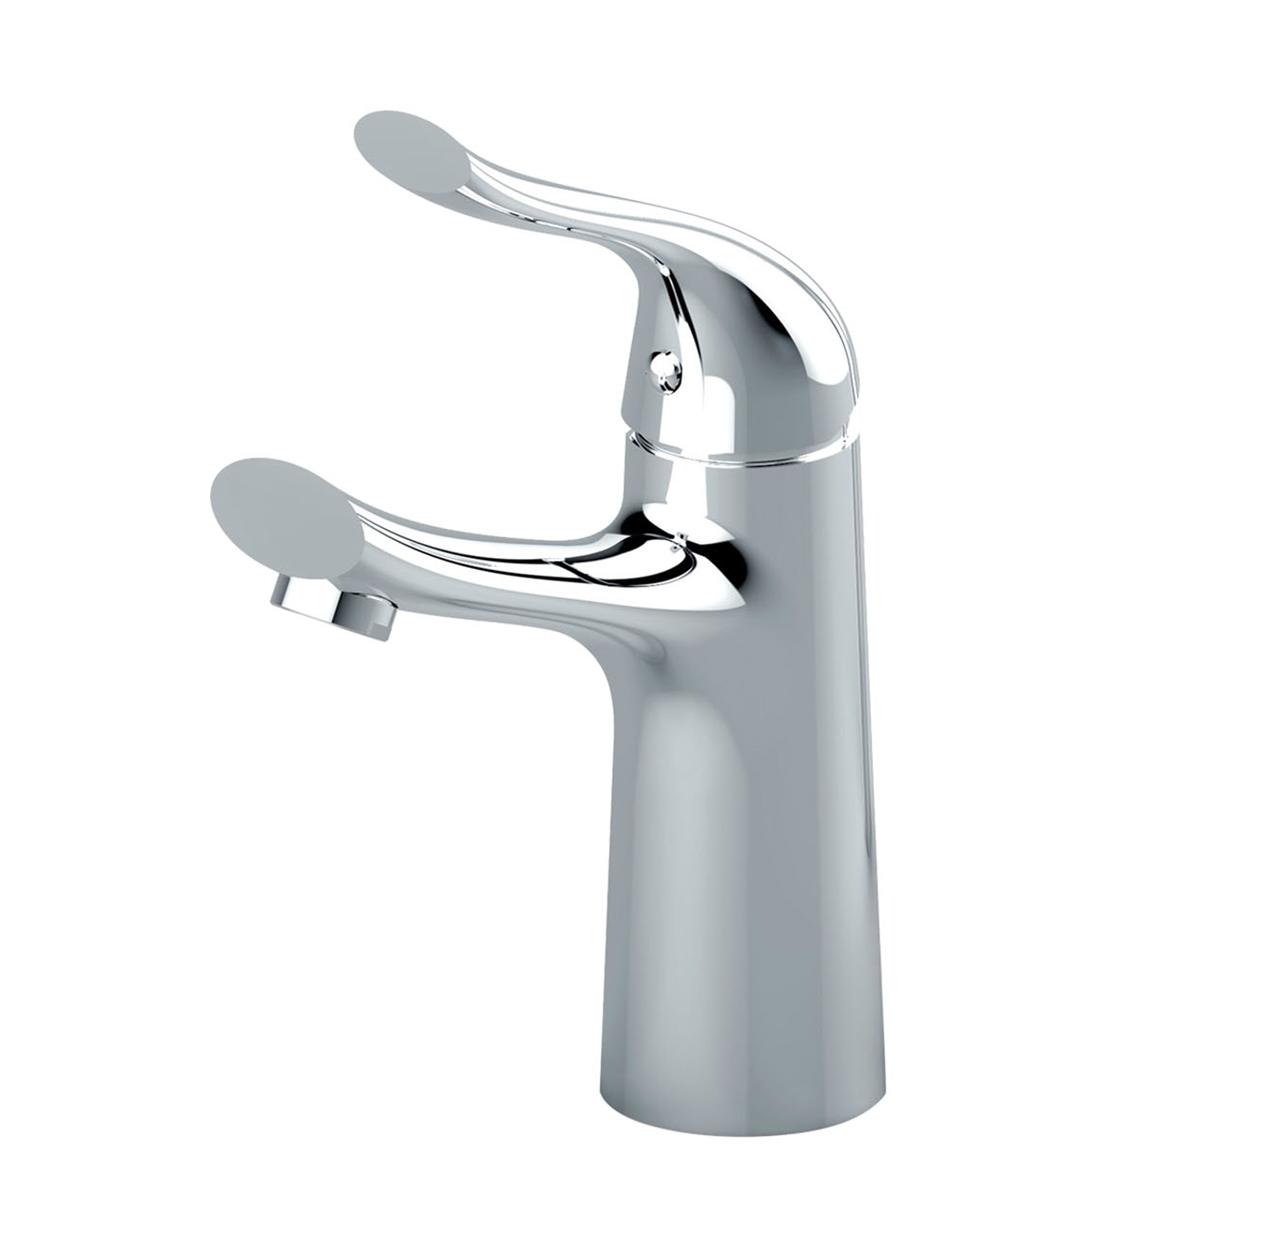 Lyon Single Handle Deck Mounted Bathroom Sink Faucet